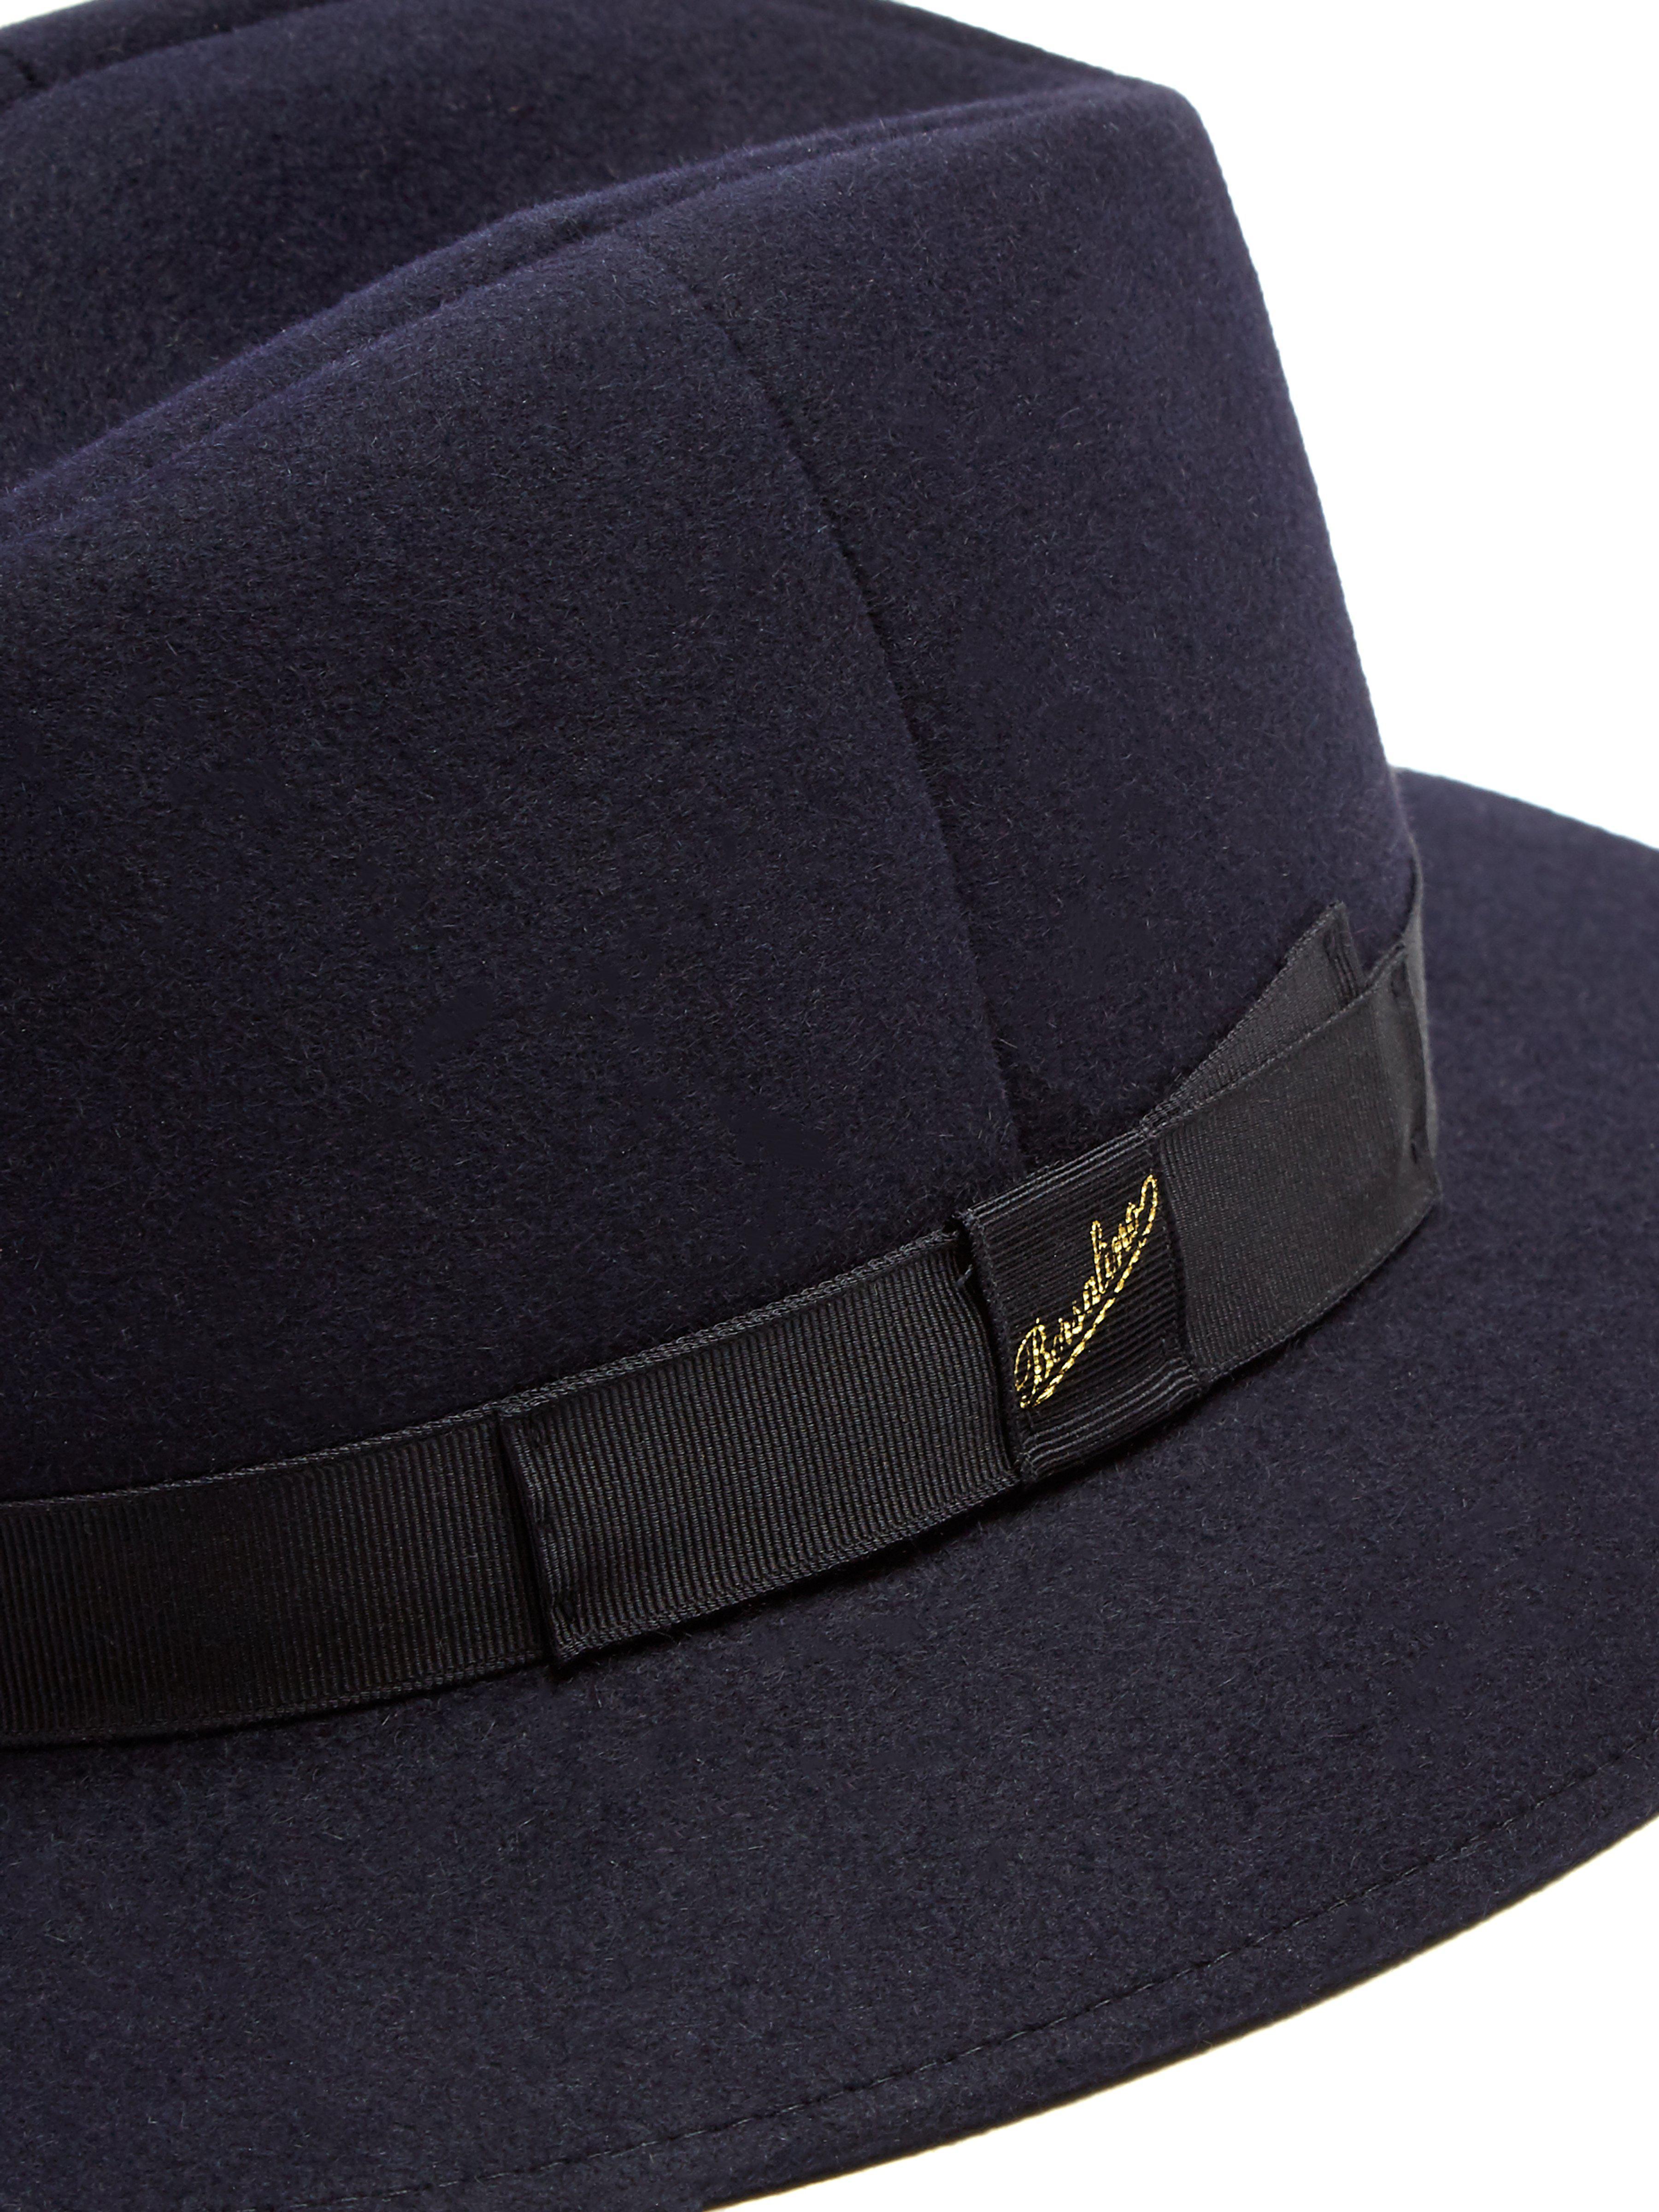 4df6f8bc86f Borsalino Alessandria Casual Felt Hat in Blue for Men - Lyst